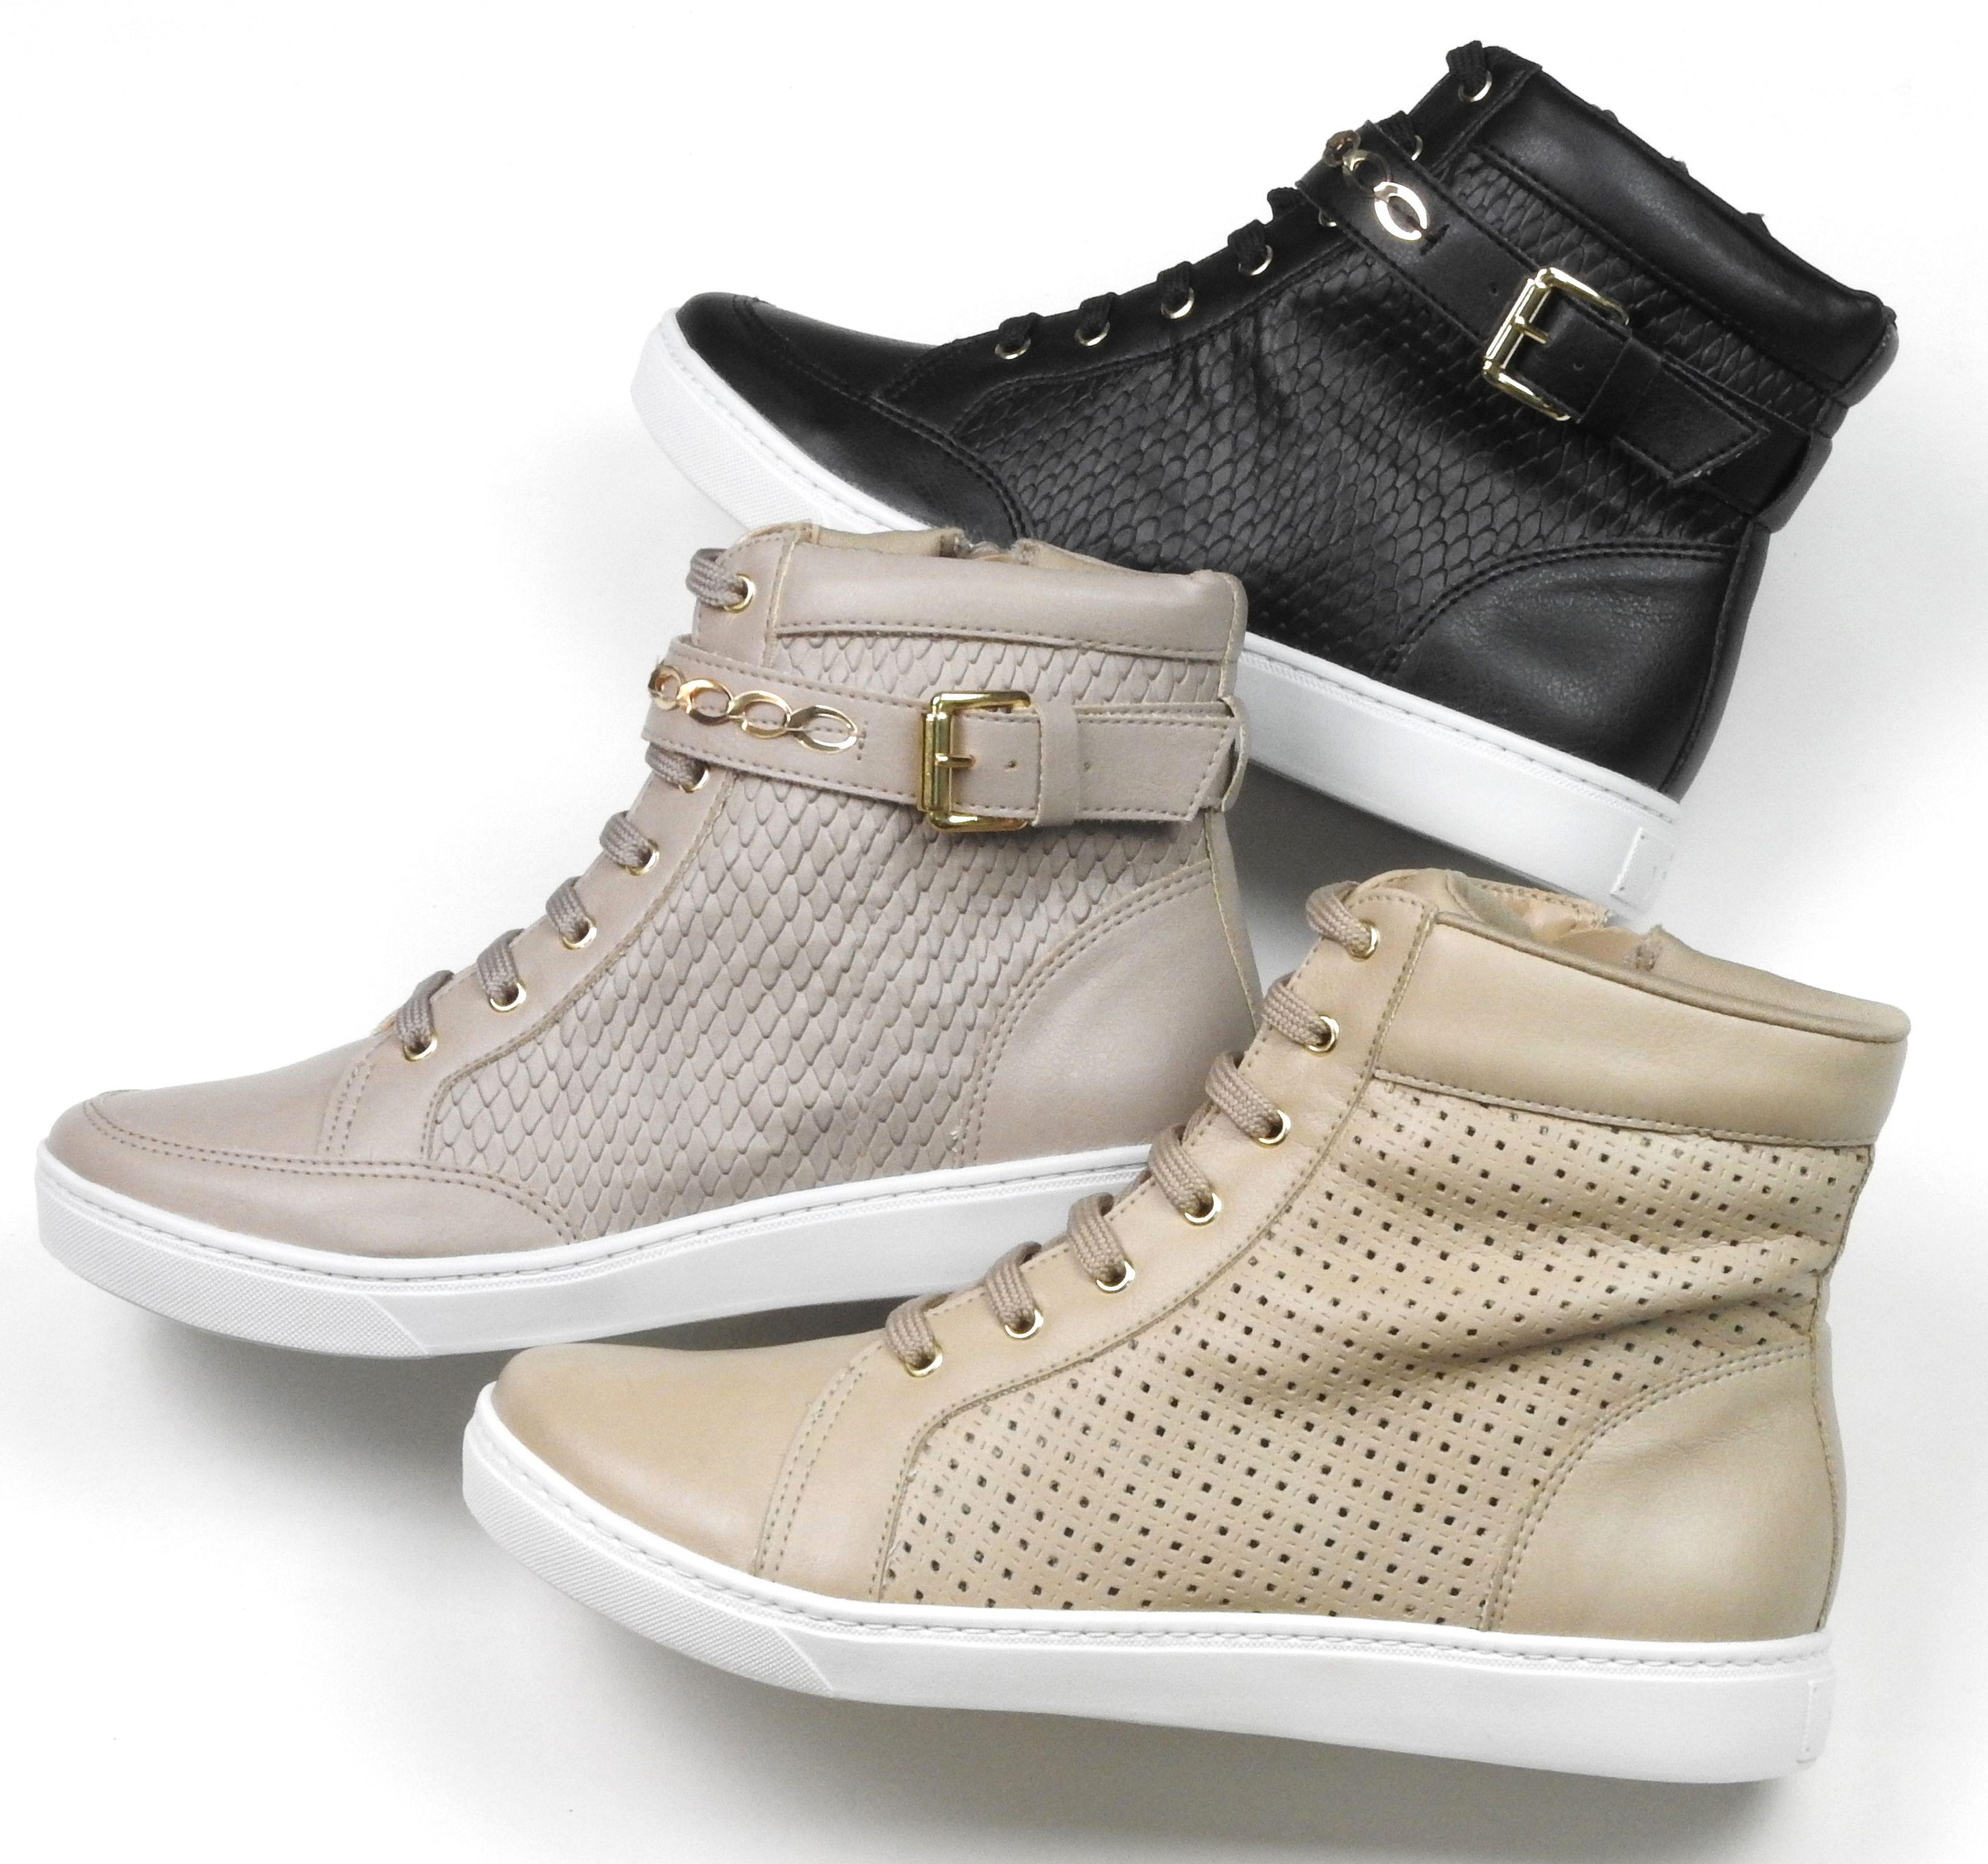 58612830af7 tênis - tendência - tênis botinha - trend - sneaker - Ref. 16-12410 ...